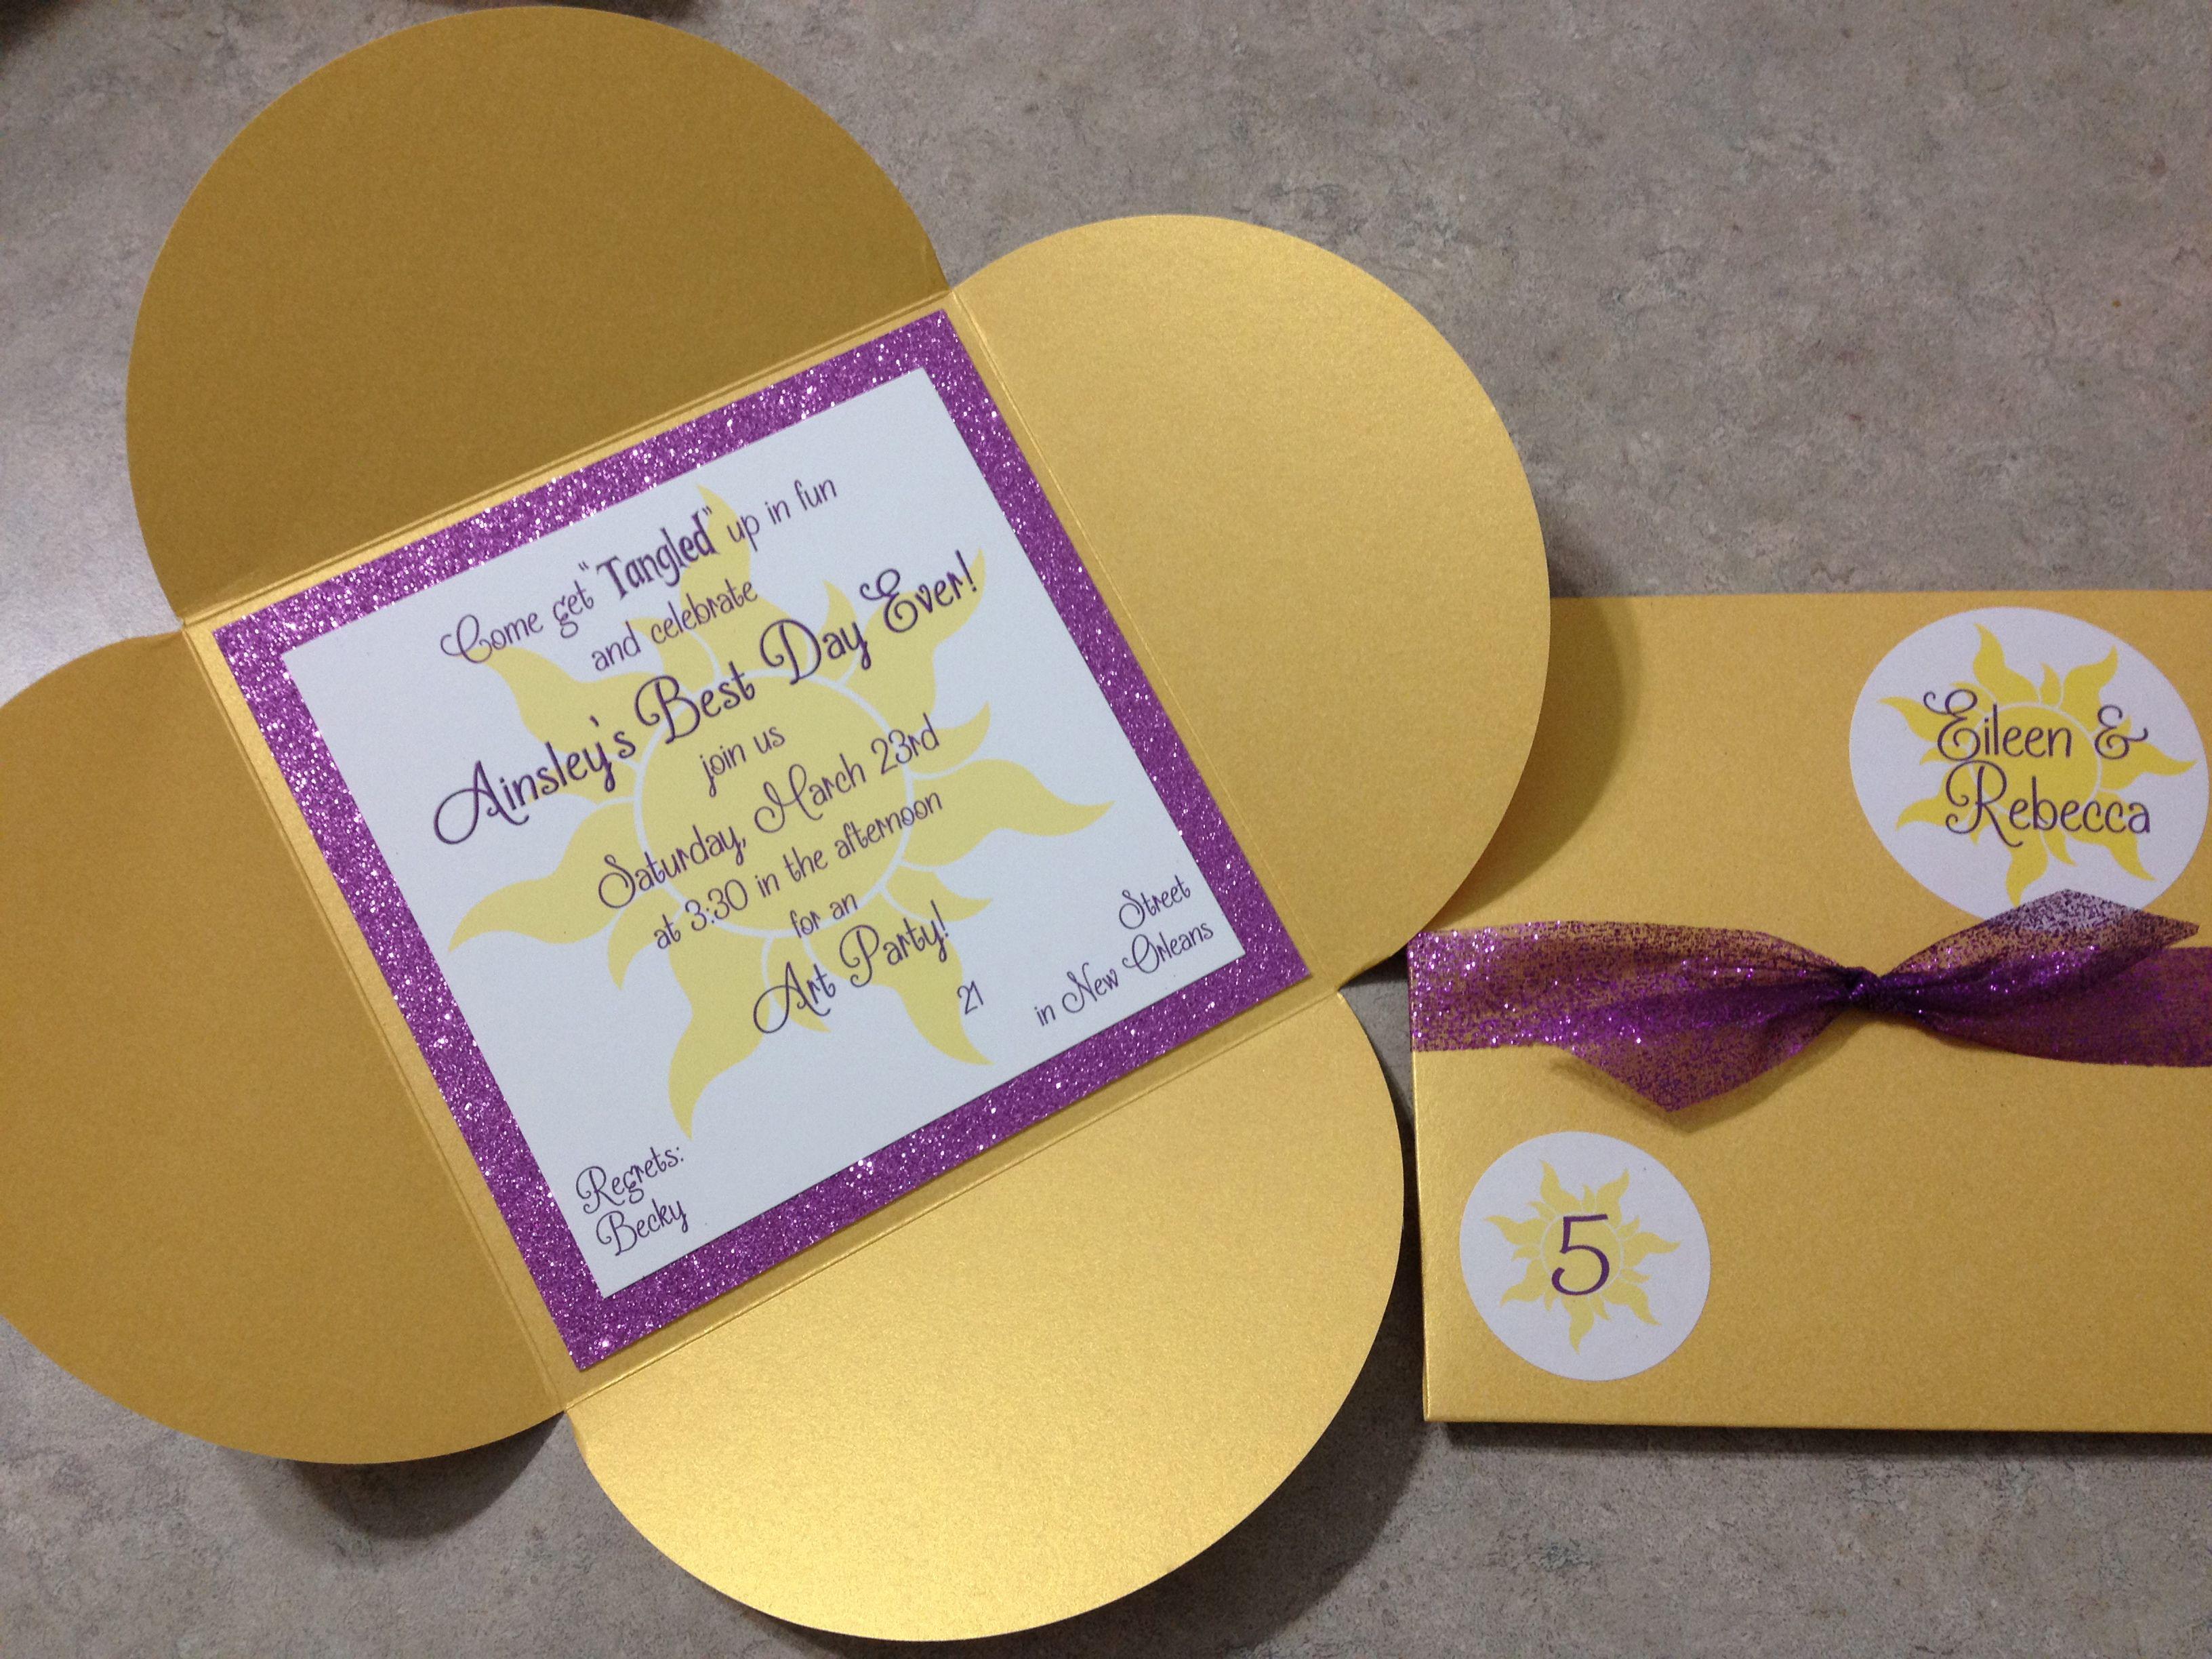 Scrapbook paper envelope - Made From Cards Pockets Gold Petal Envelope And Michael S Grape Glitter Scrapbook Paper